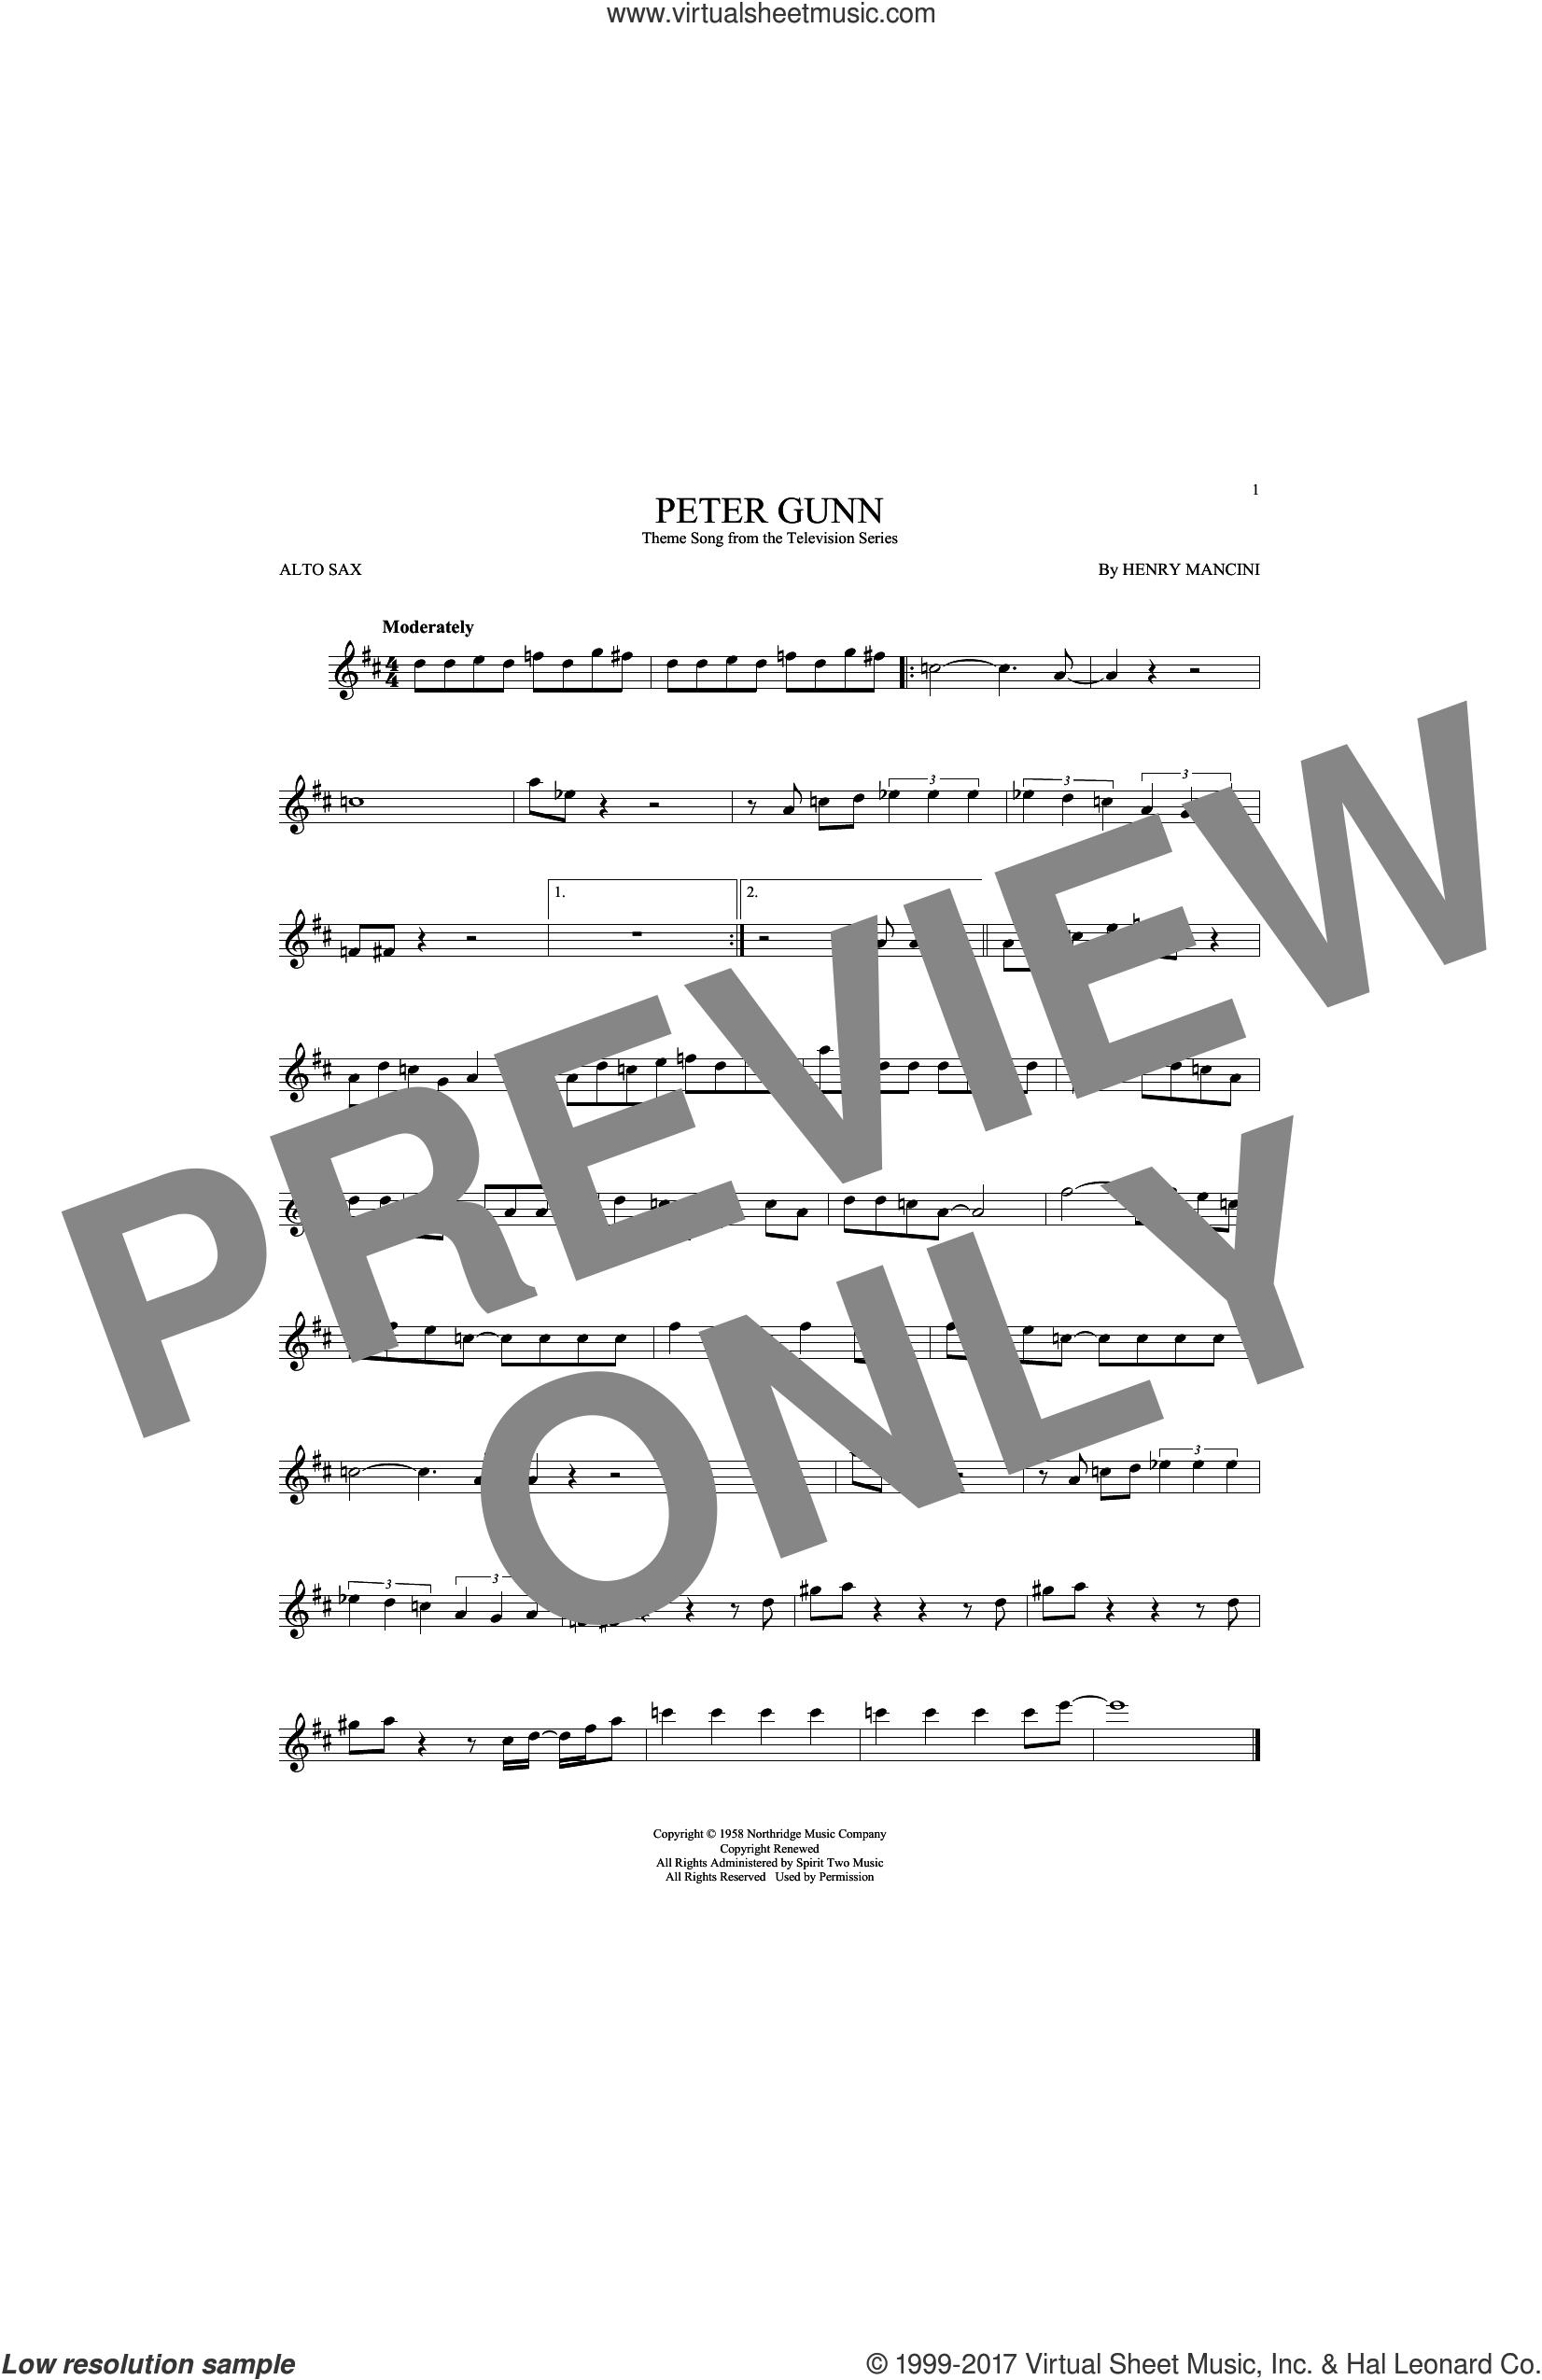 Peter Gunn sheet music for alto saxophone solo by Henry Mancini, intermediate skill level